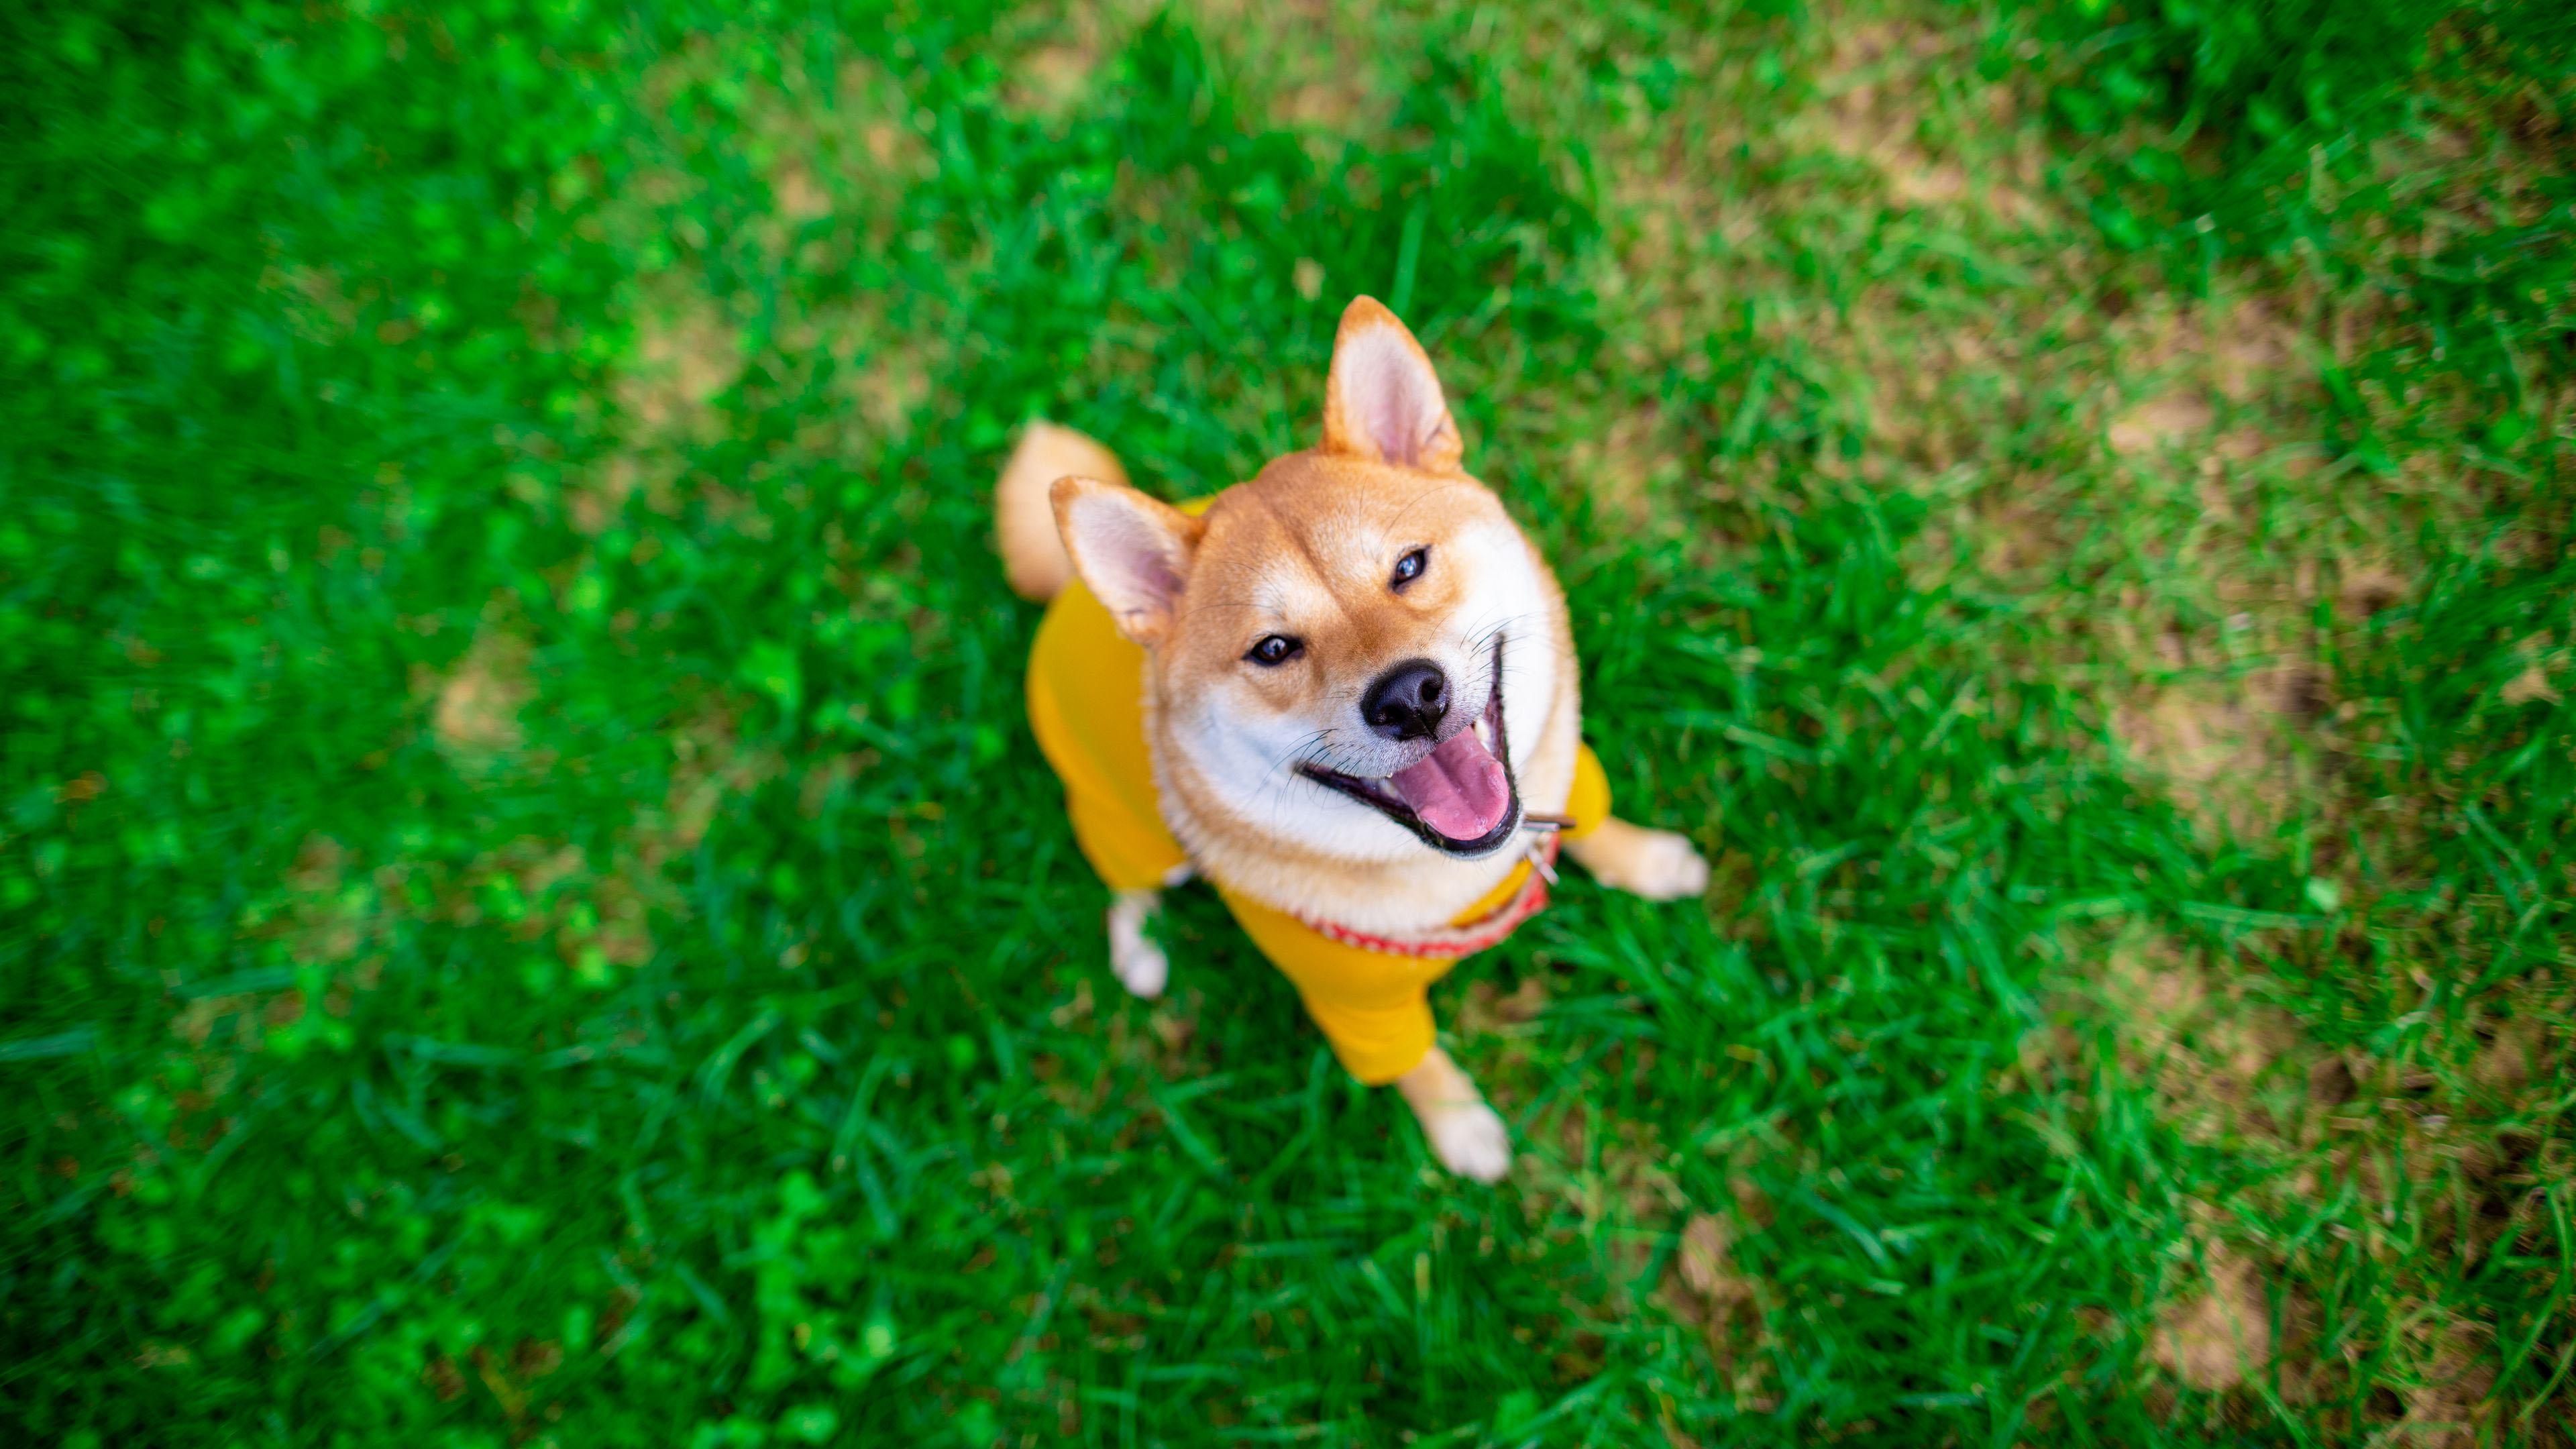 4K专区,柴犬,小狗,小狗,可爱,